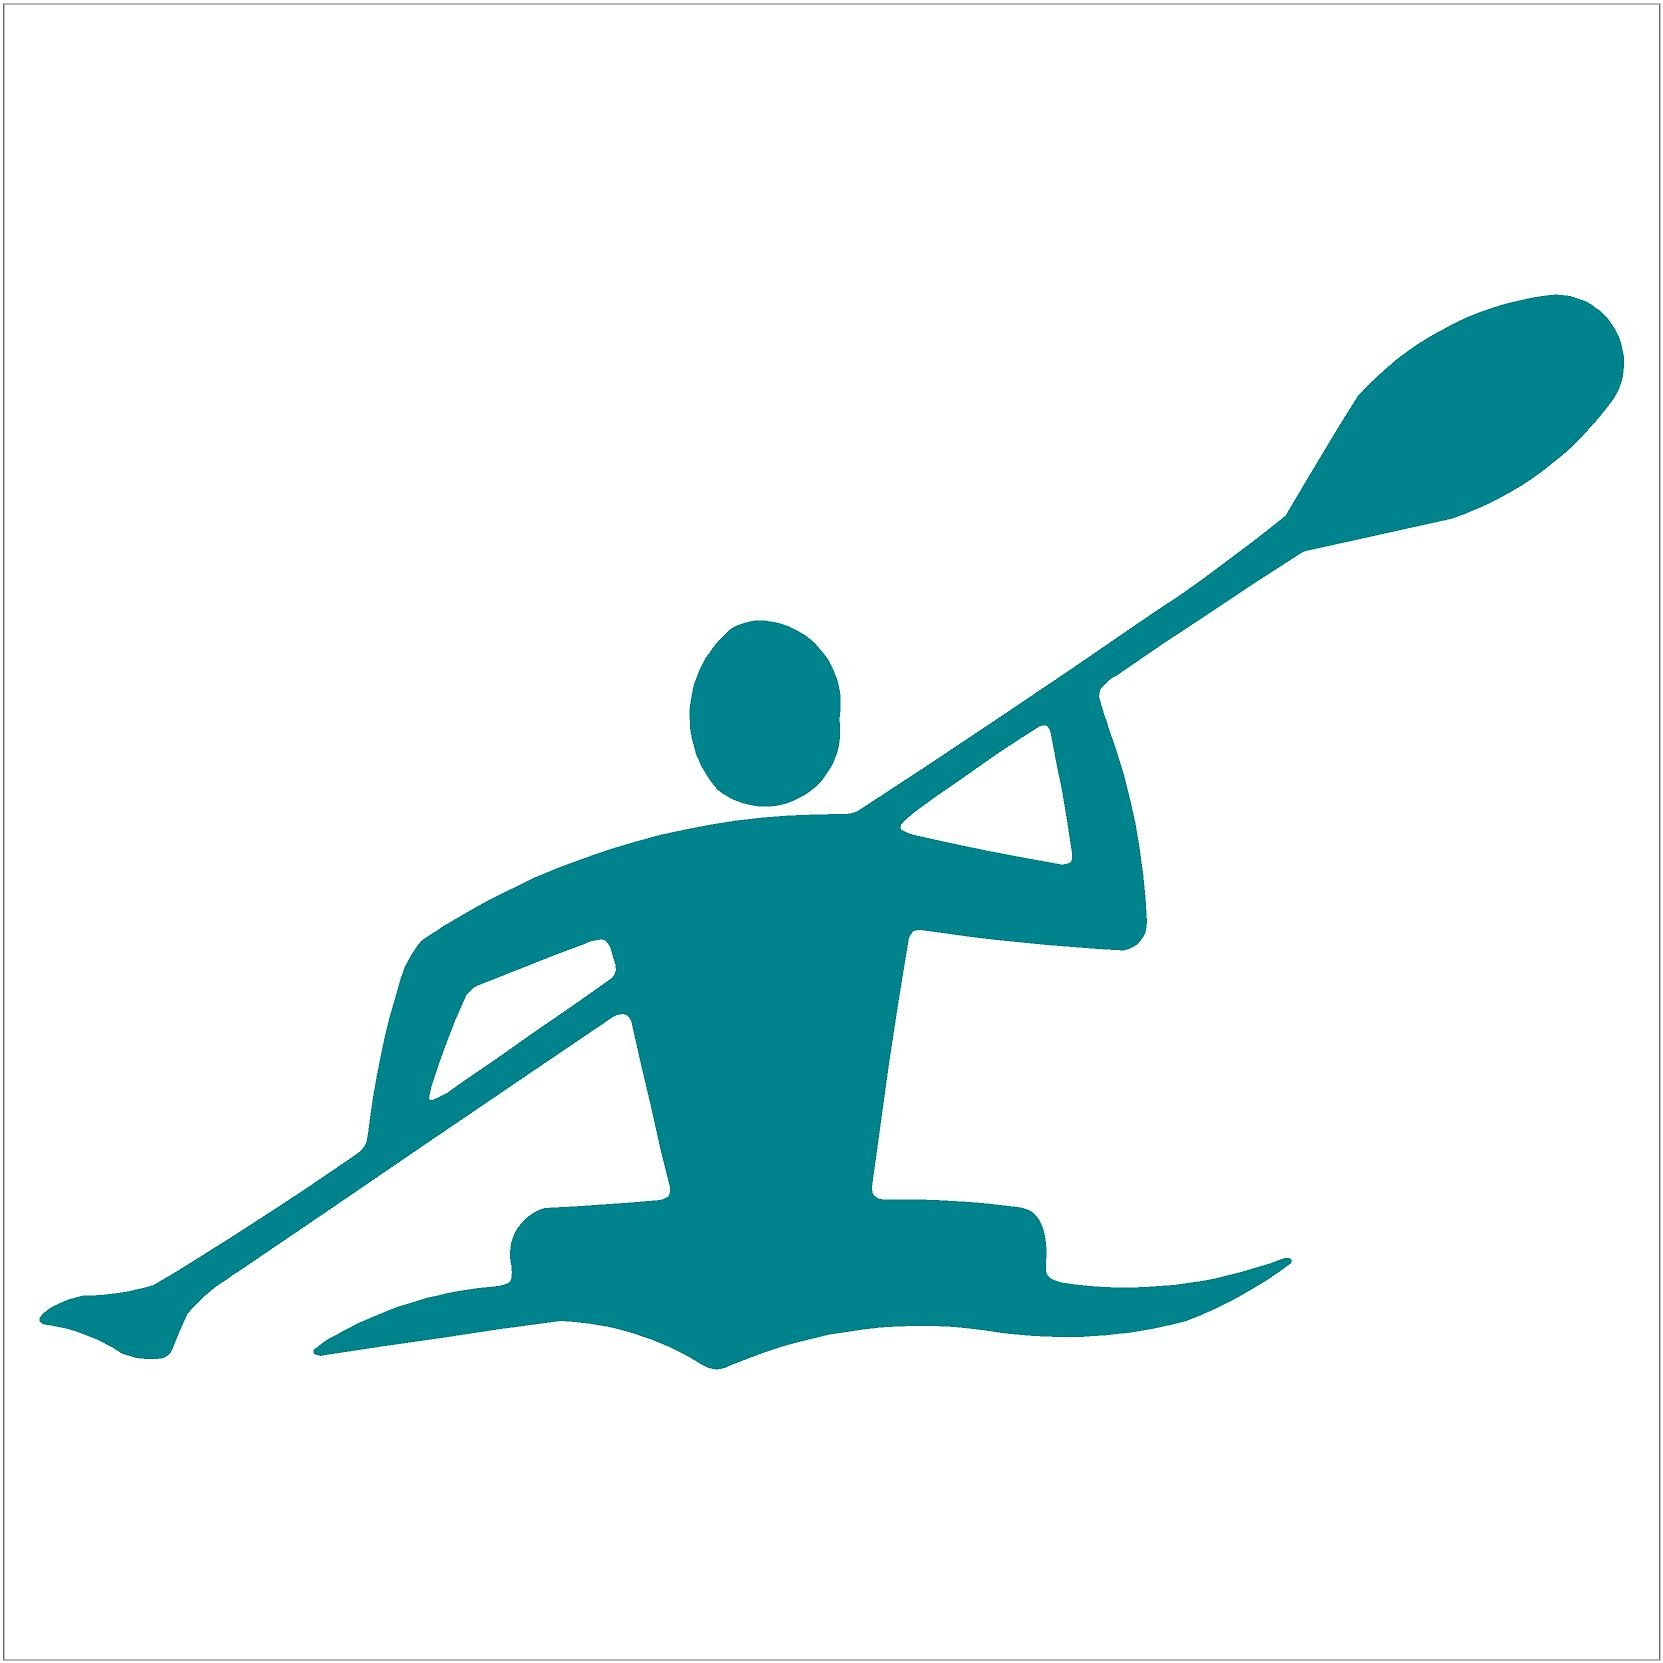 "Kayaker Paddle Kayak Canoe Decal (6"" decal, Teal)"